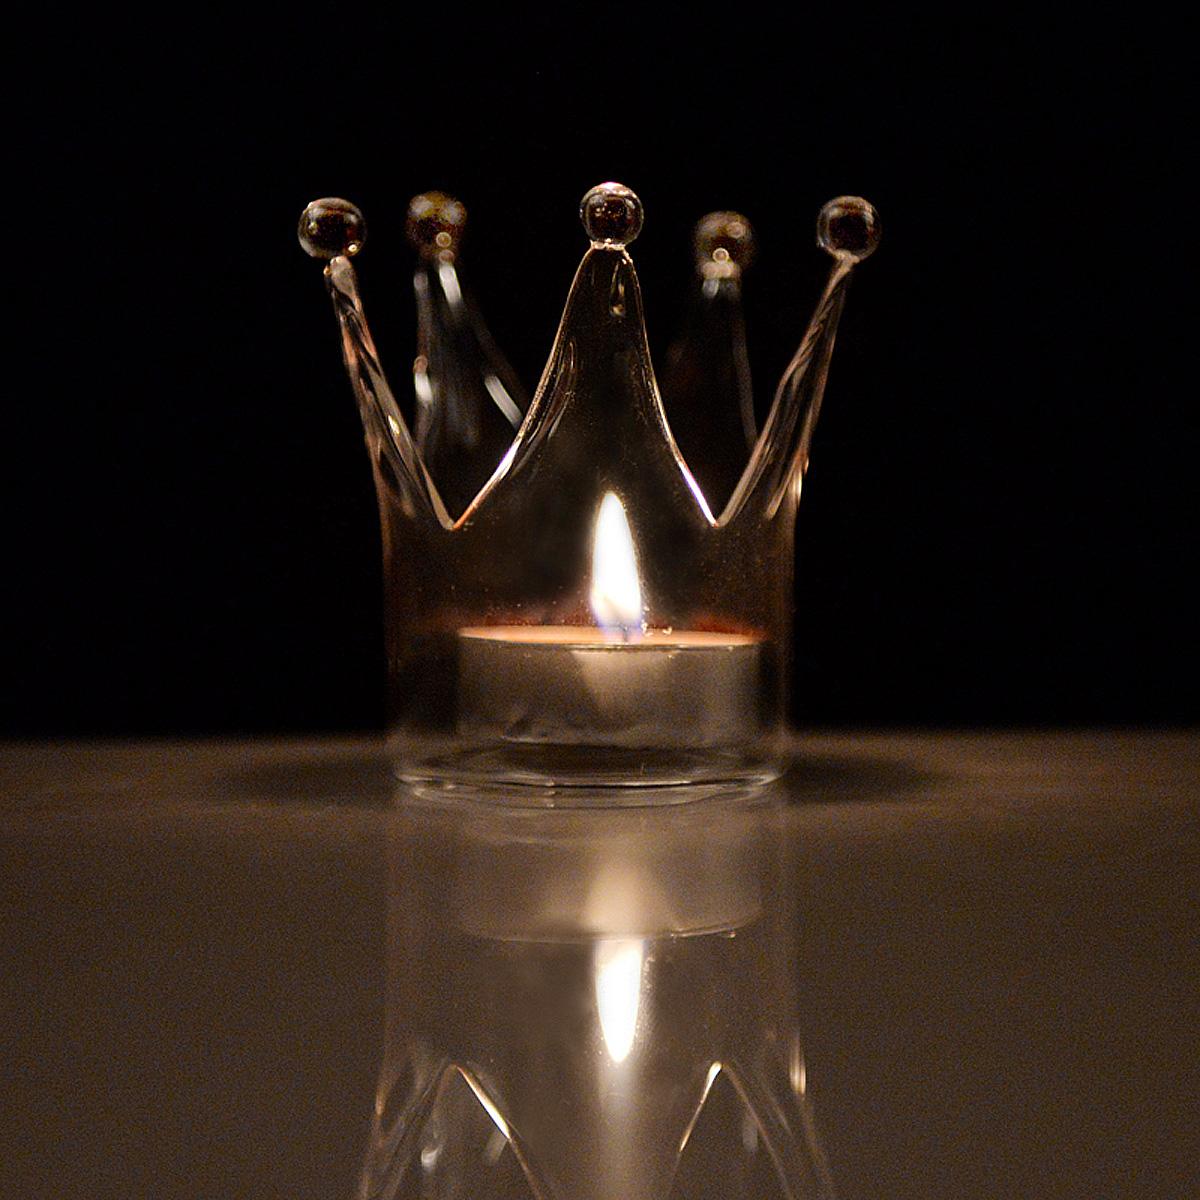 transparent crown shape glass candle holder bowls wedding